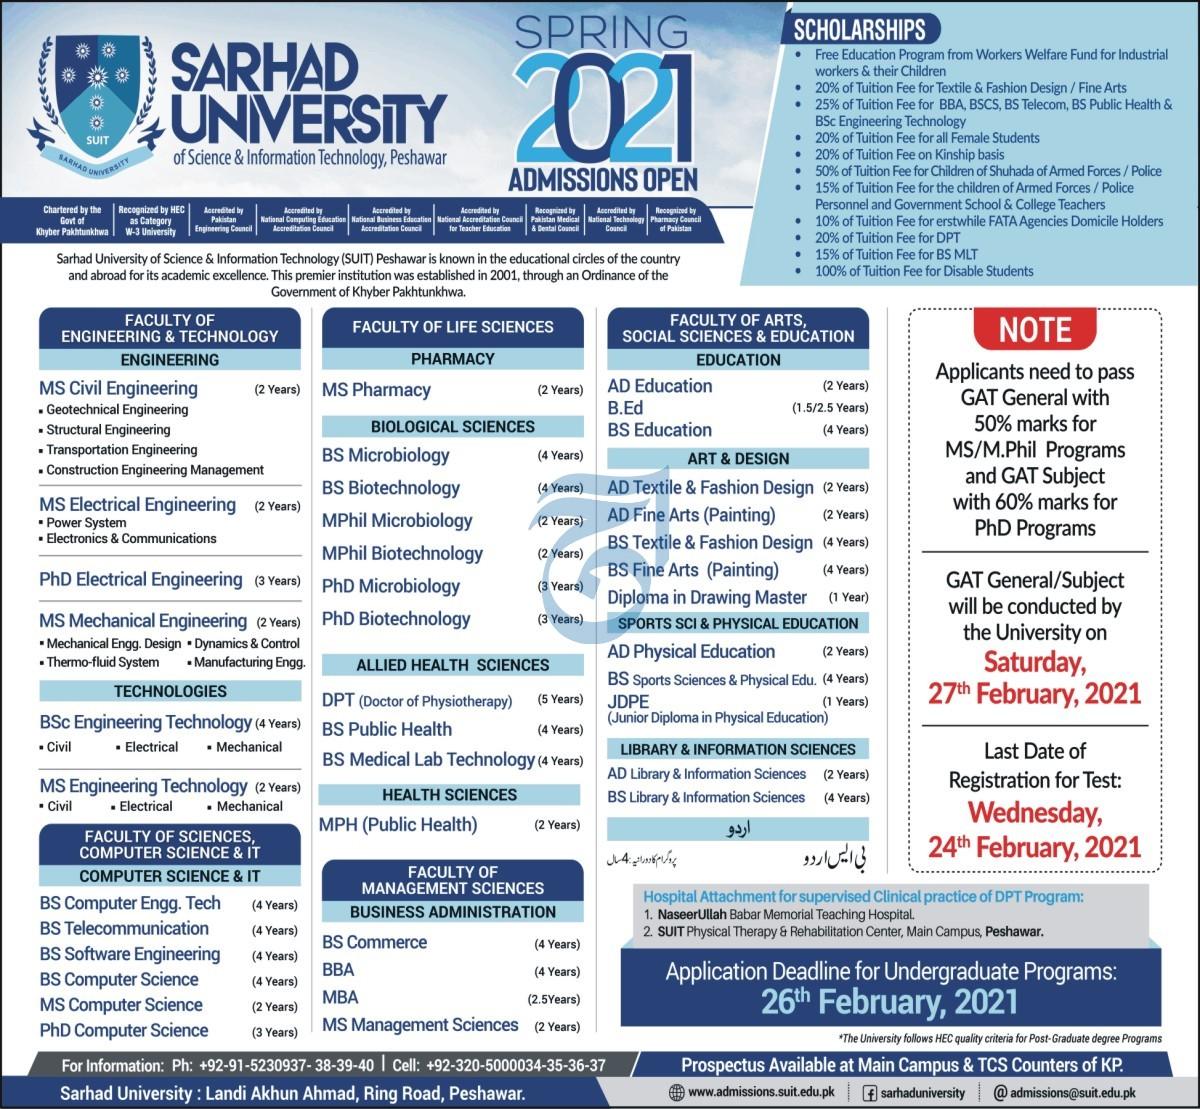 Sarhad University Of Sciences & Information Technology Peshawar Admissions